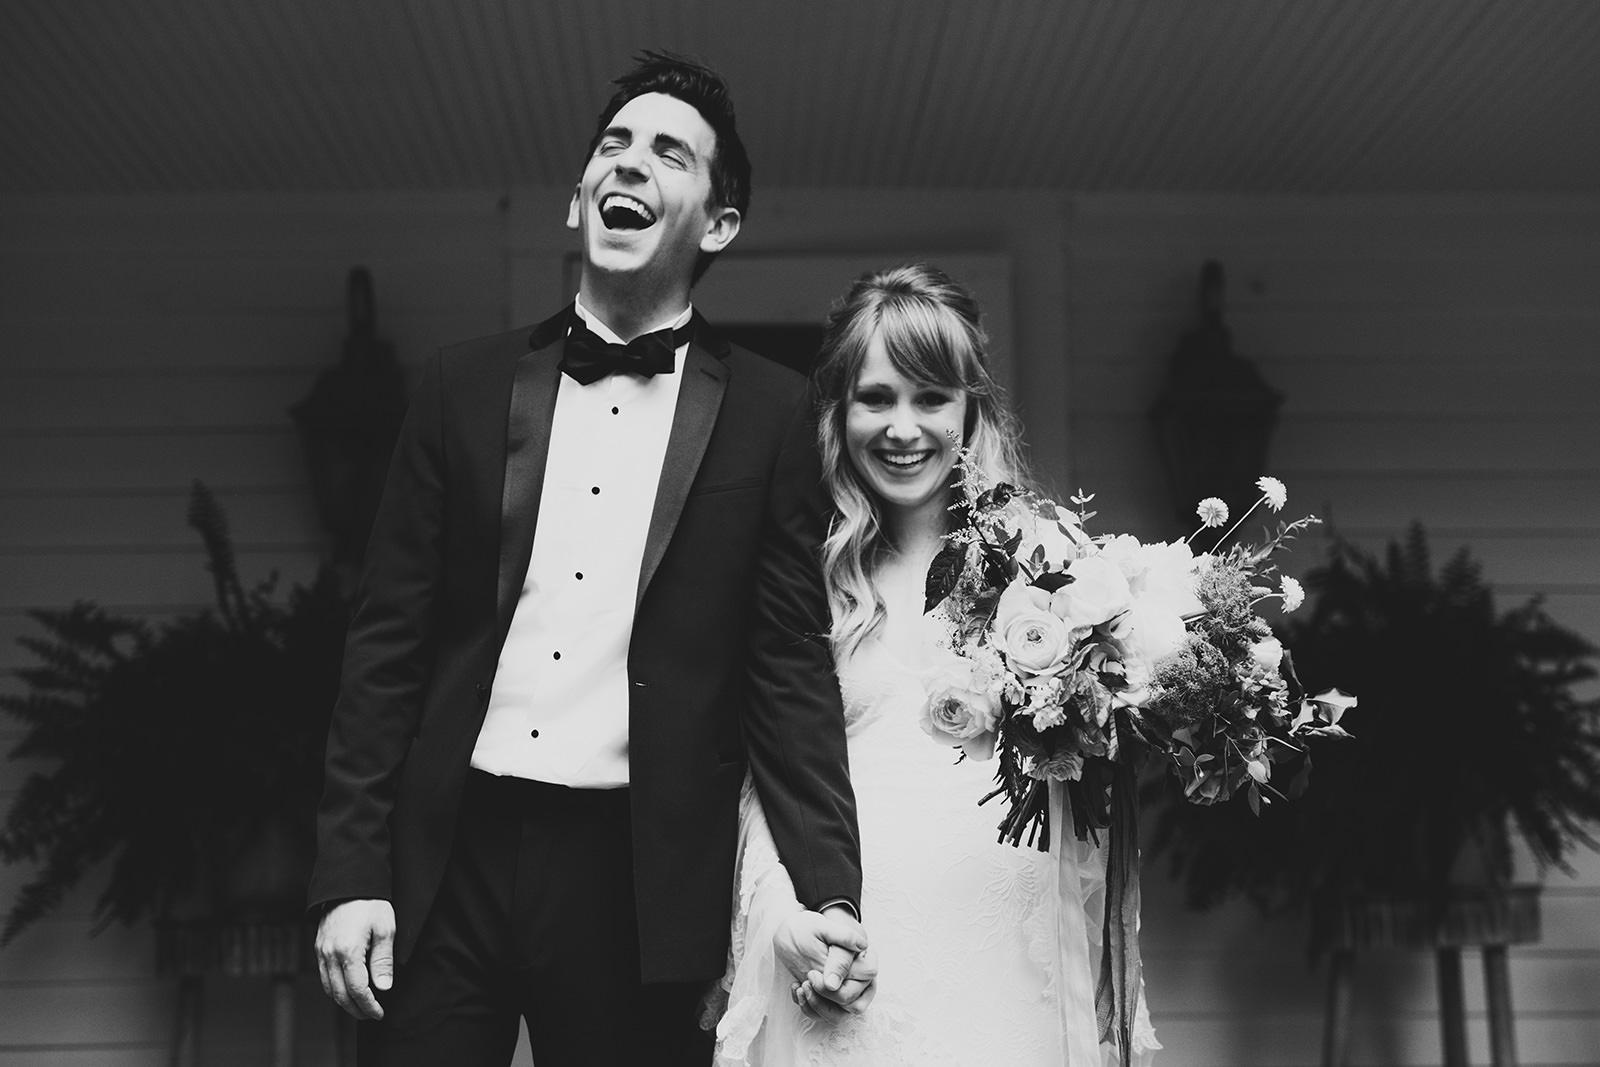 weddings at rock quarry